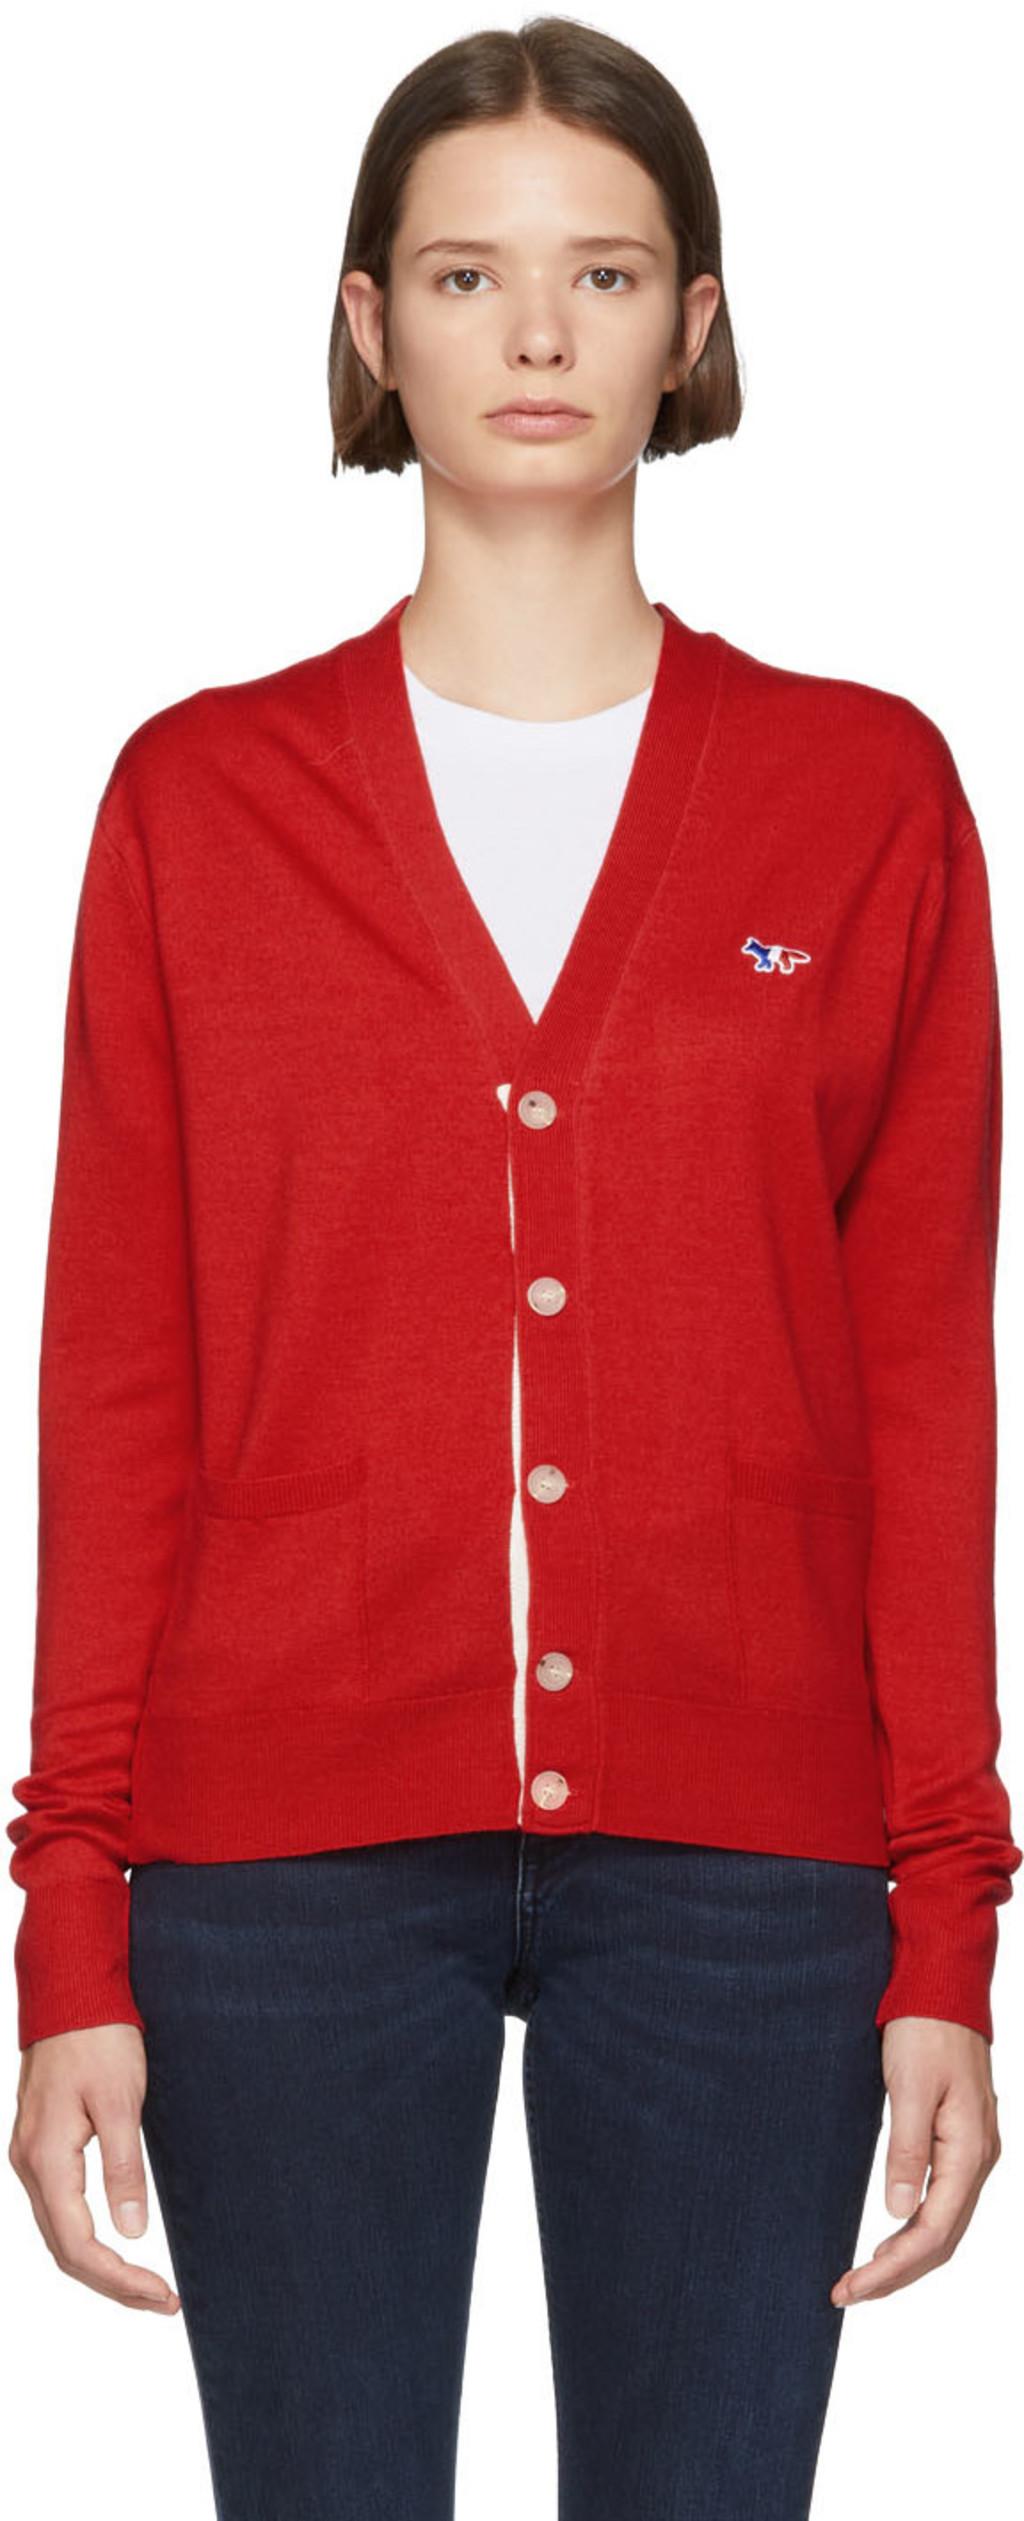 Maison Kitsun For Women Fw18 Collection Ssense Zipper Hoodie Polos Red